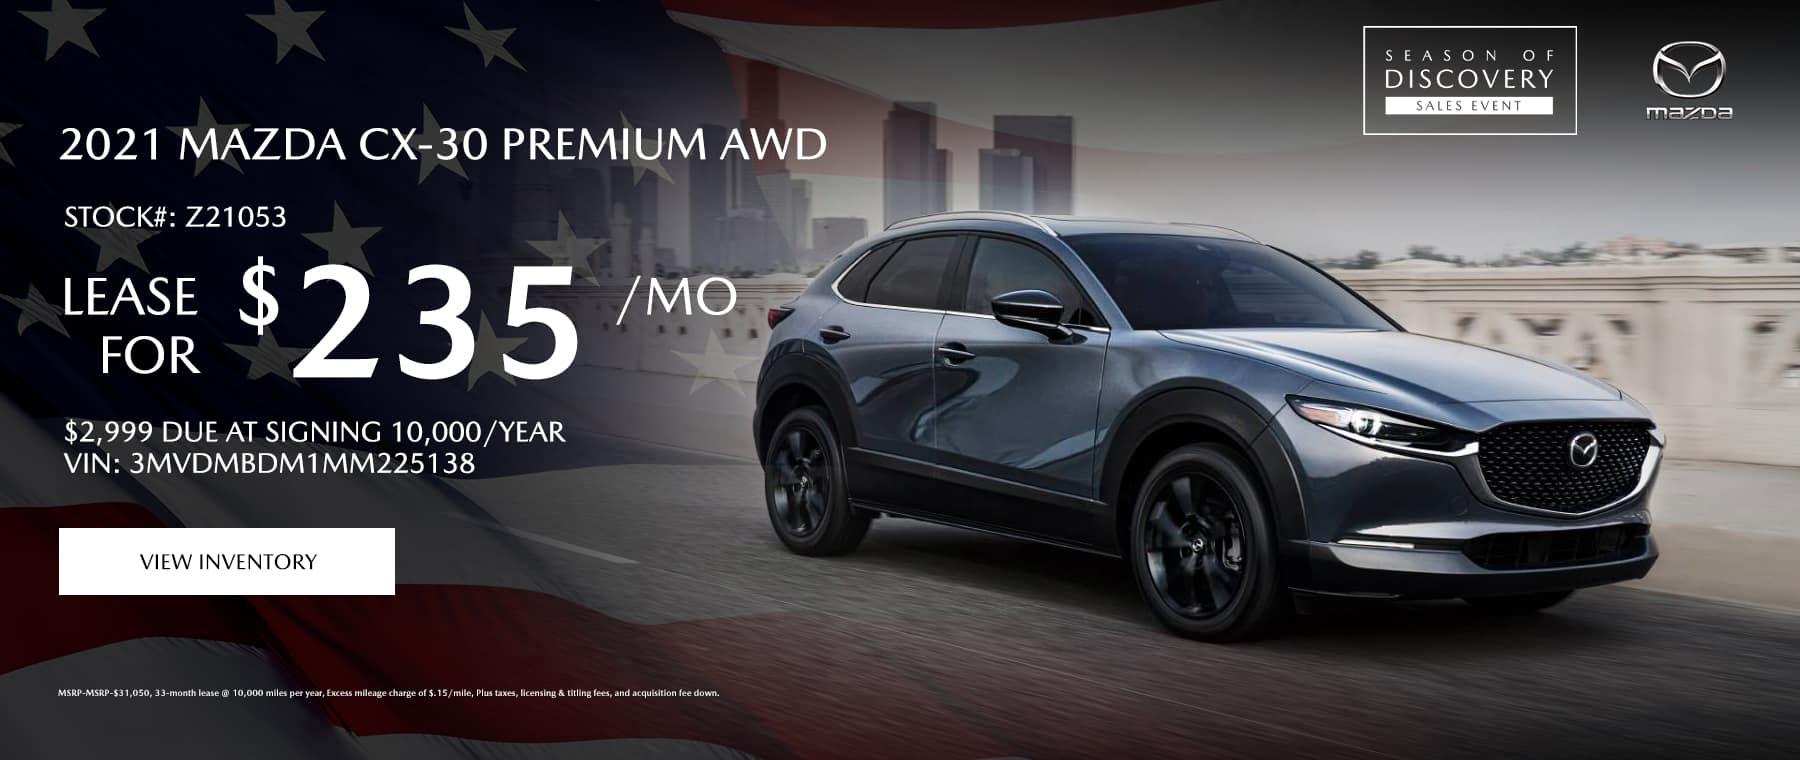 2021 Mazda CX-30 Premium AWD Stock#: Z21053 $235/Month $2,999 Due at Signing 10,000/Year Vin: 3MVDMBDM1MM225138